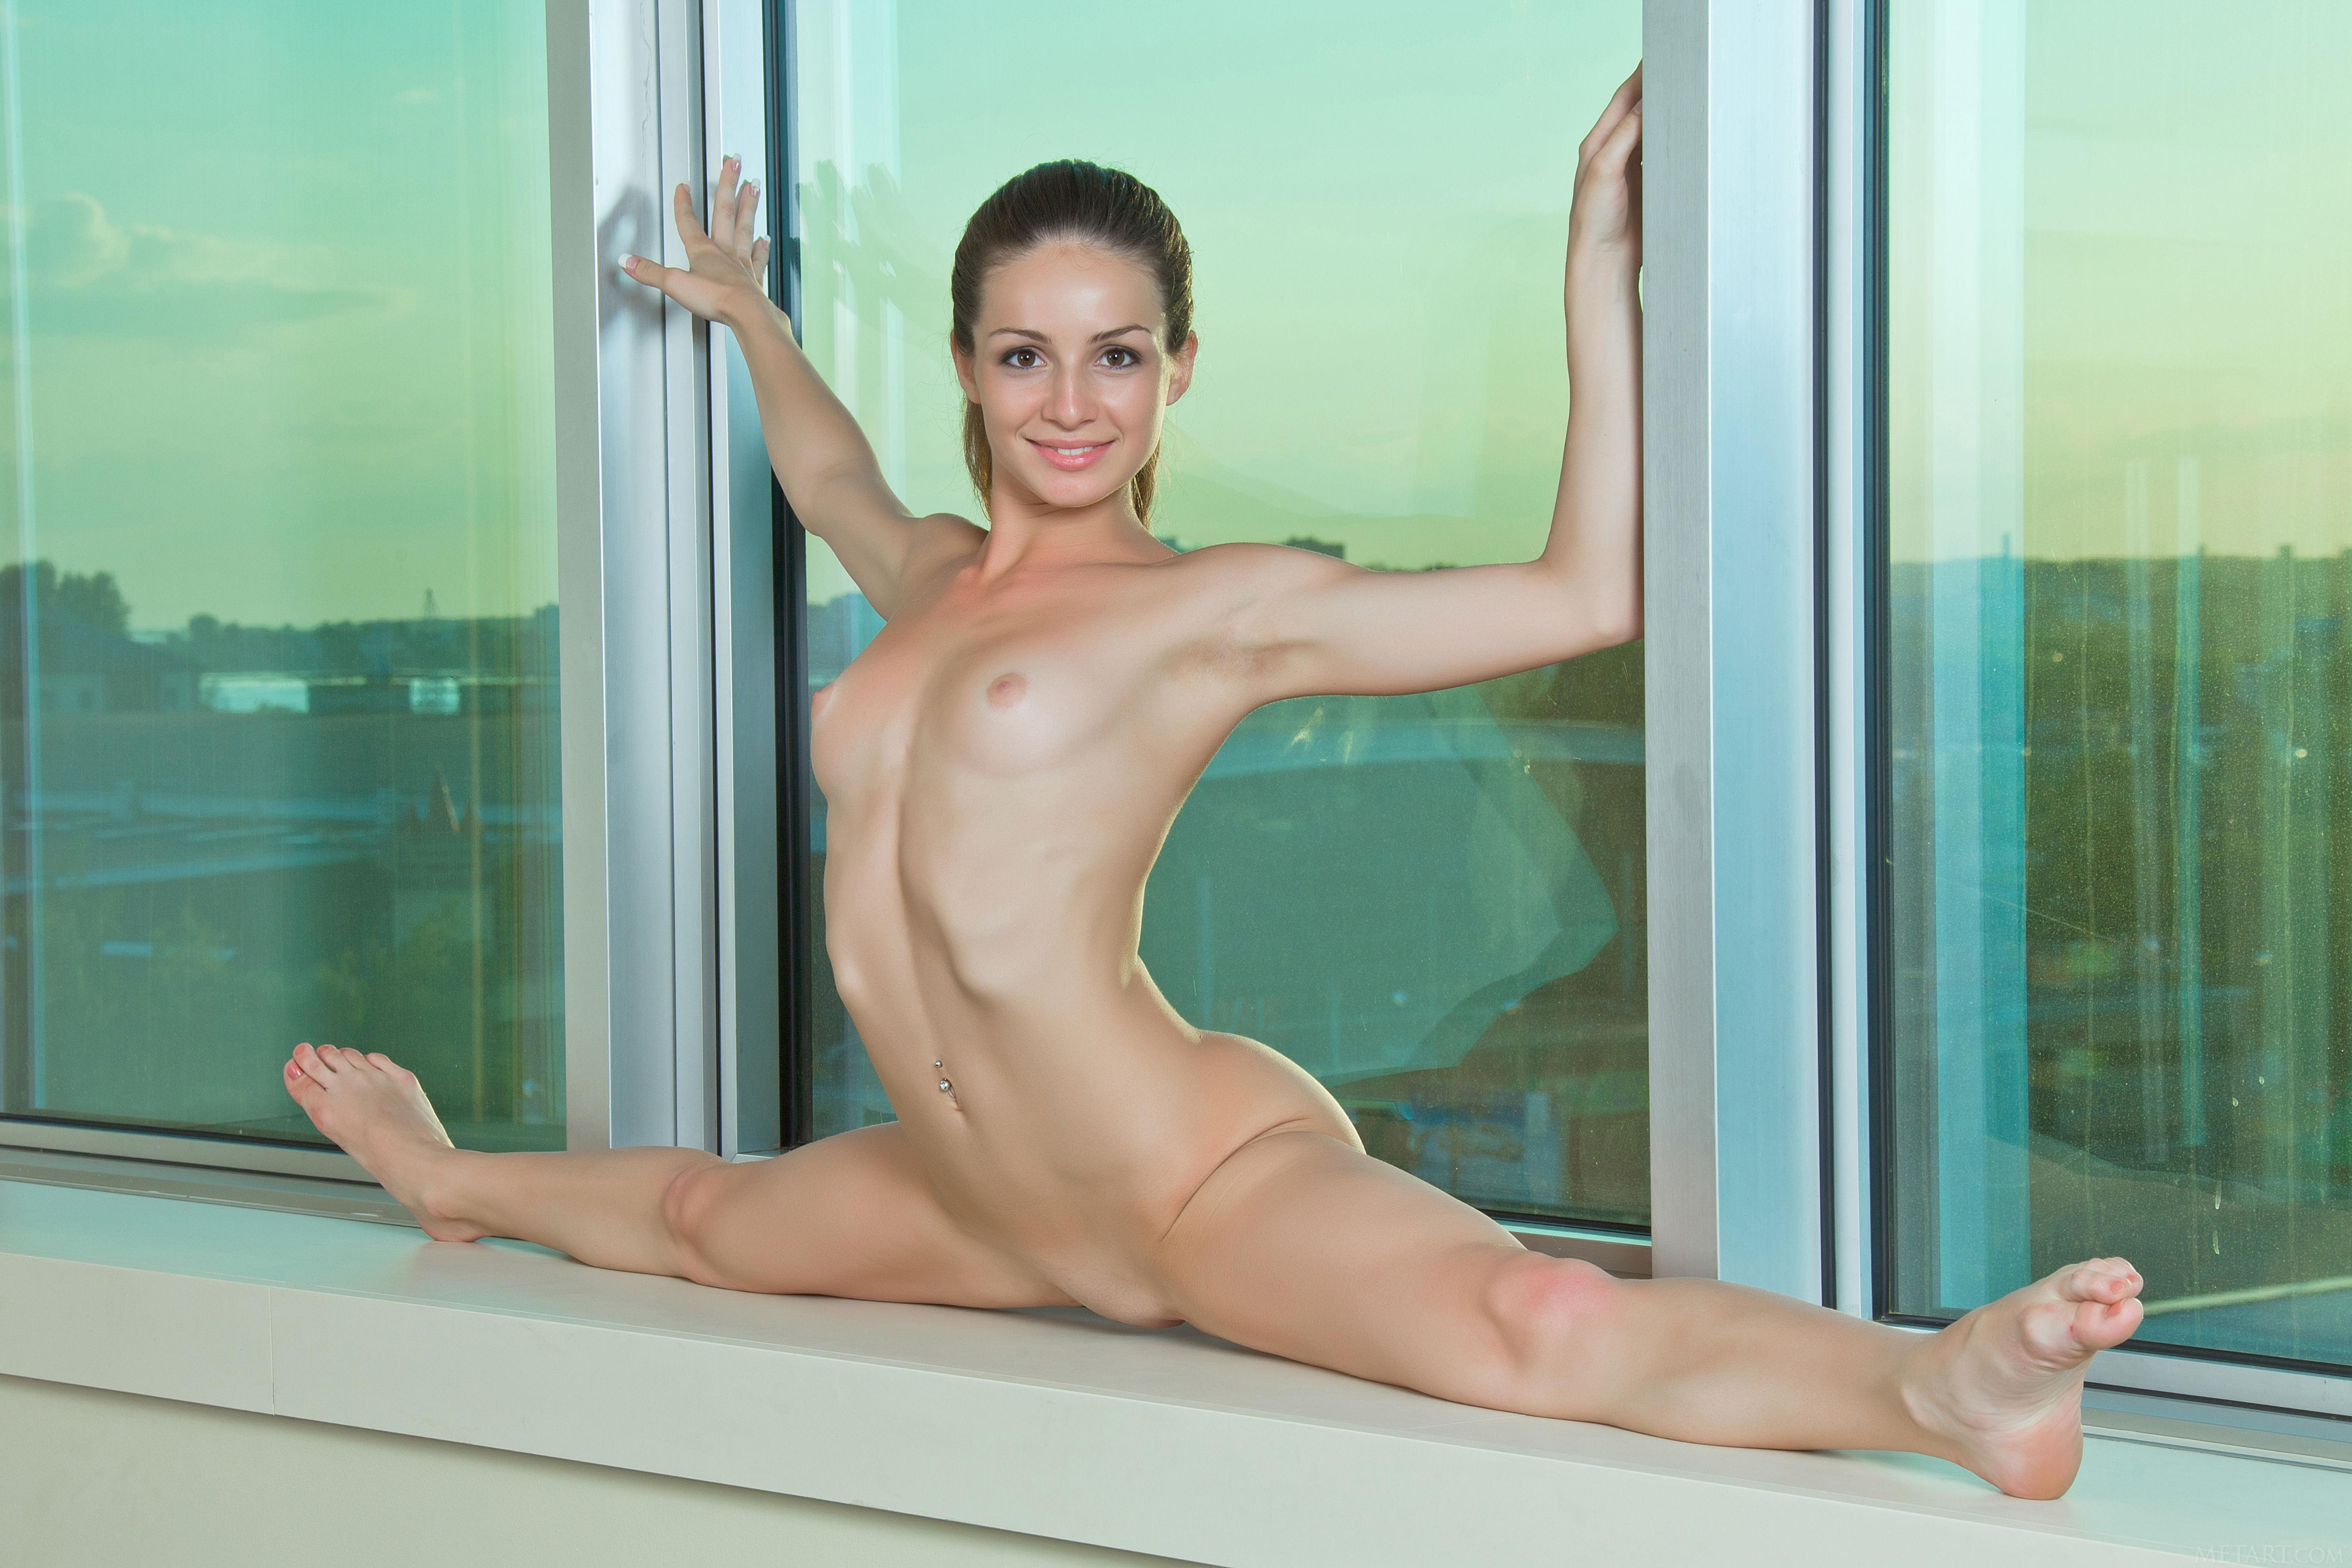 flexible-nude-girls-gymnast-splits-fetish-mix-vol2-82